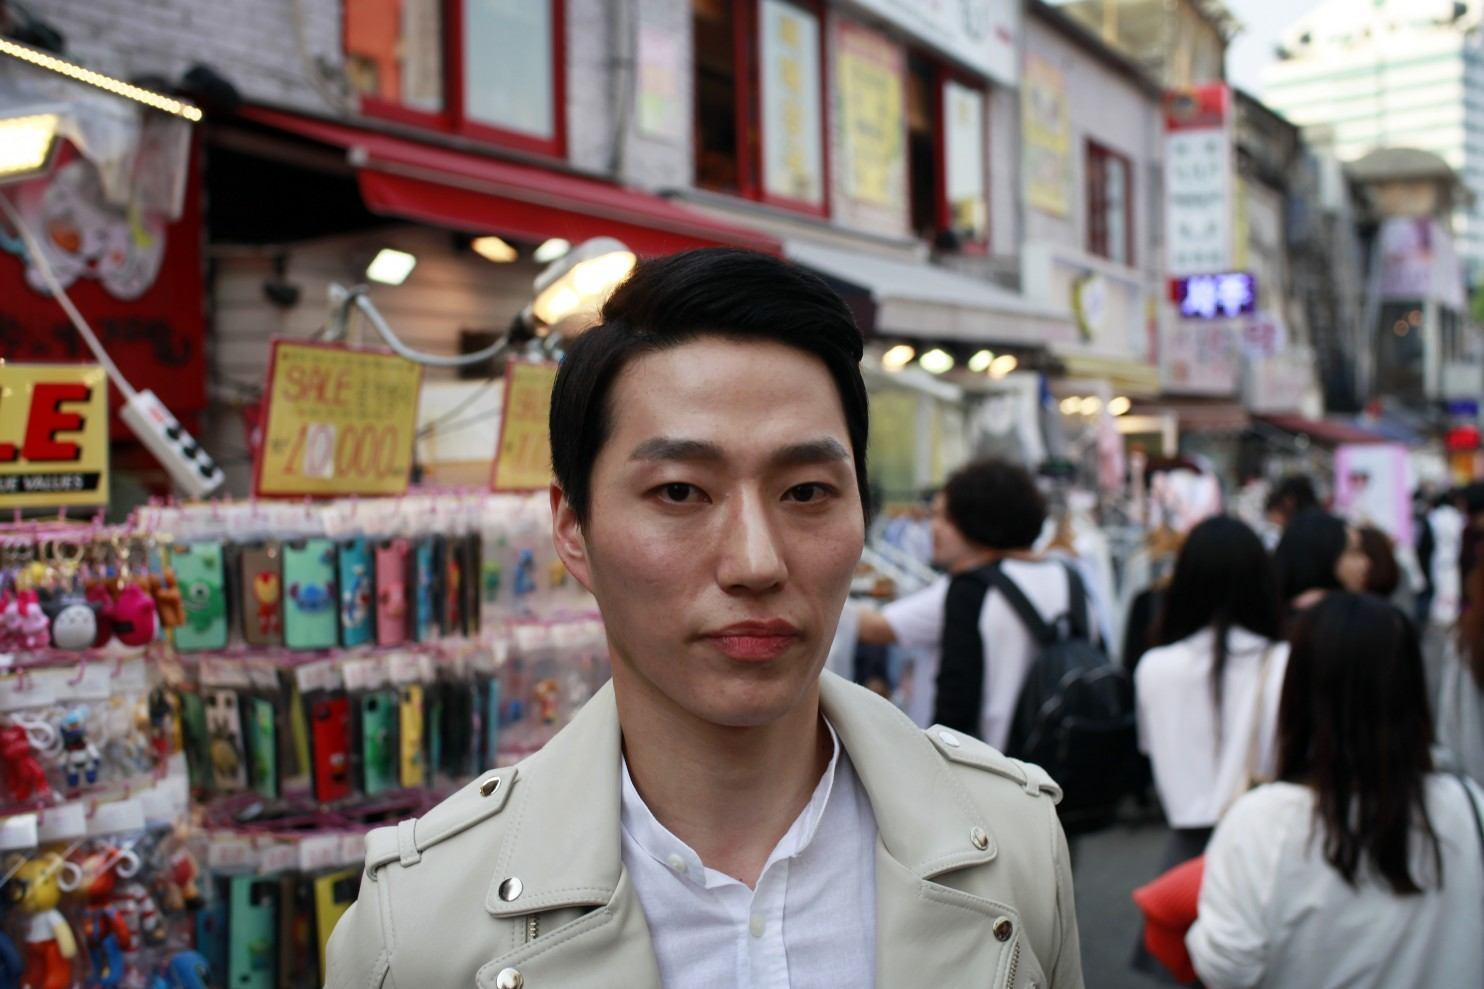 из корейскими кореи с мужчинами знакомства южной